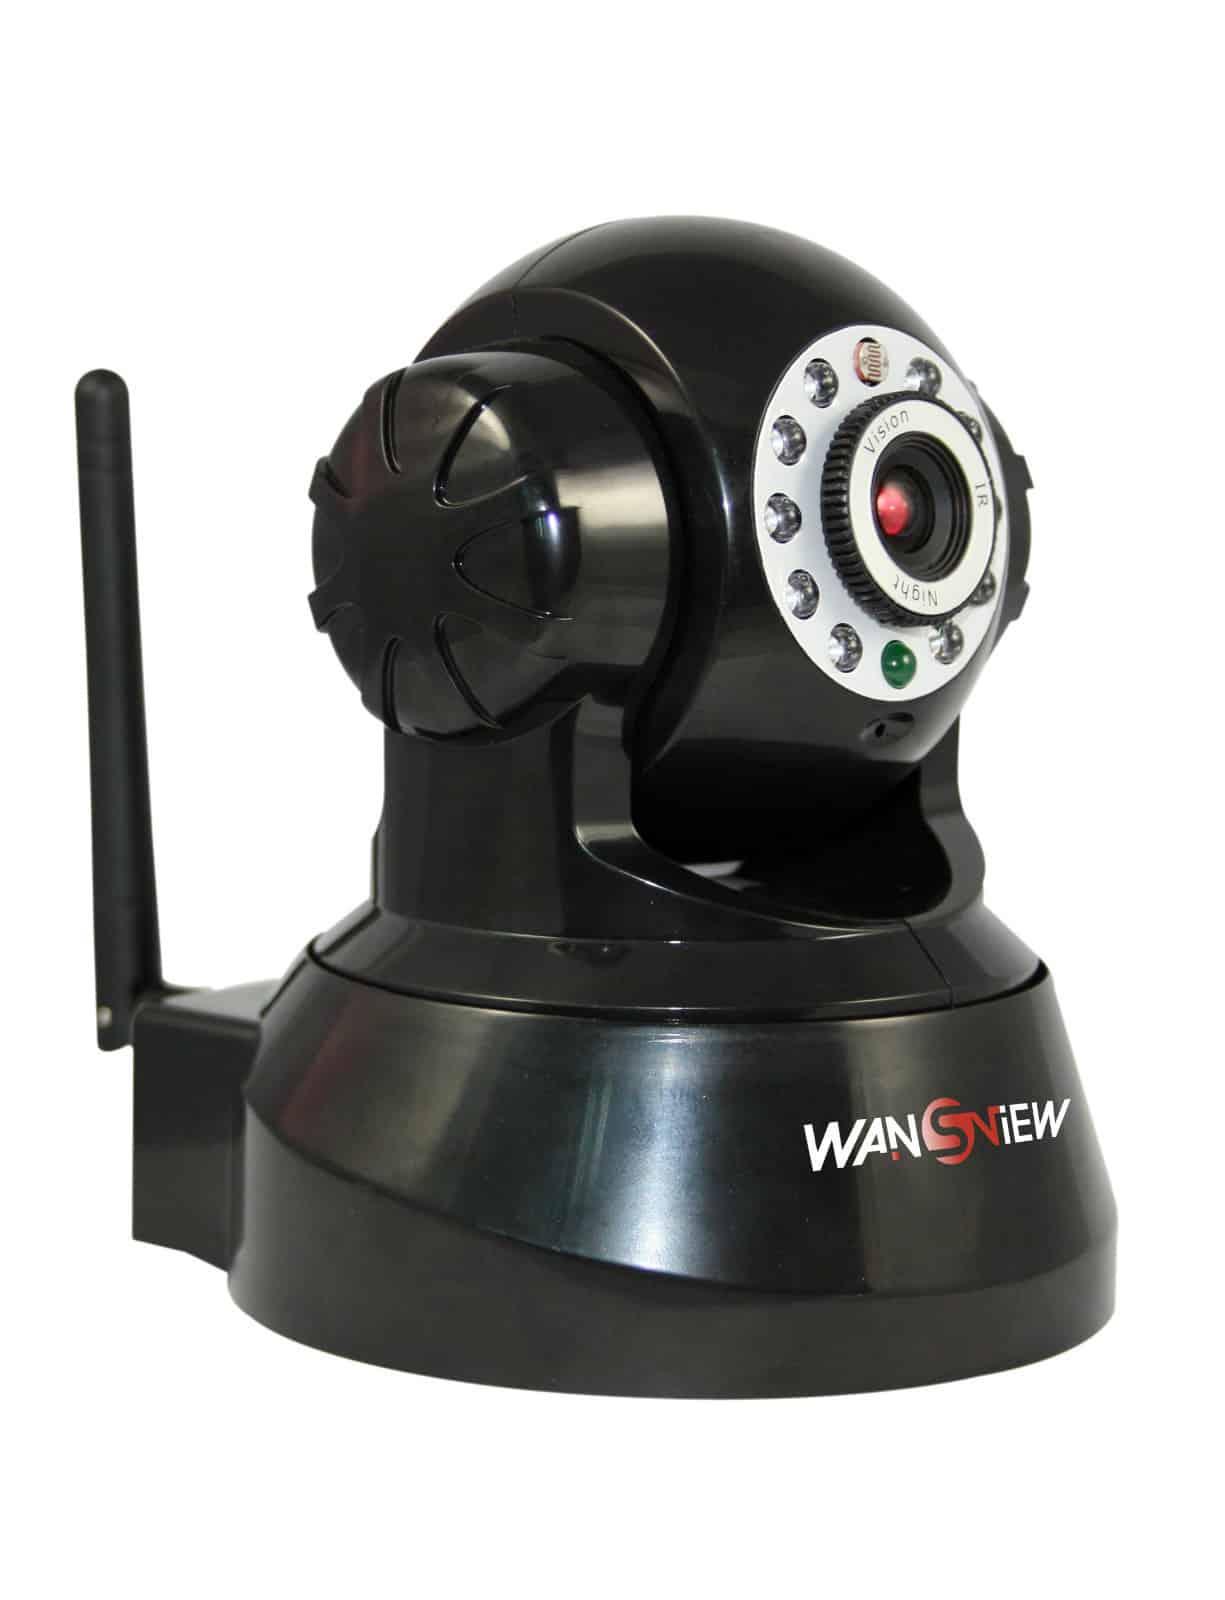 Wansview - NC541W IR CUT